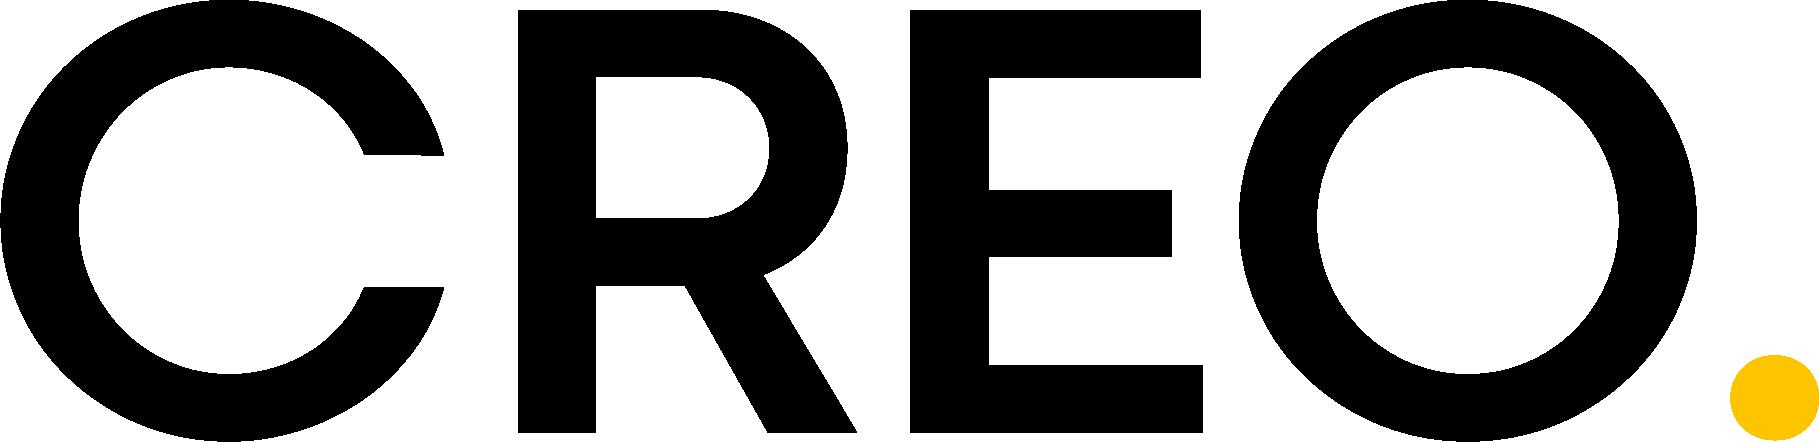 logo_Creo_colore